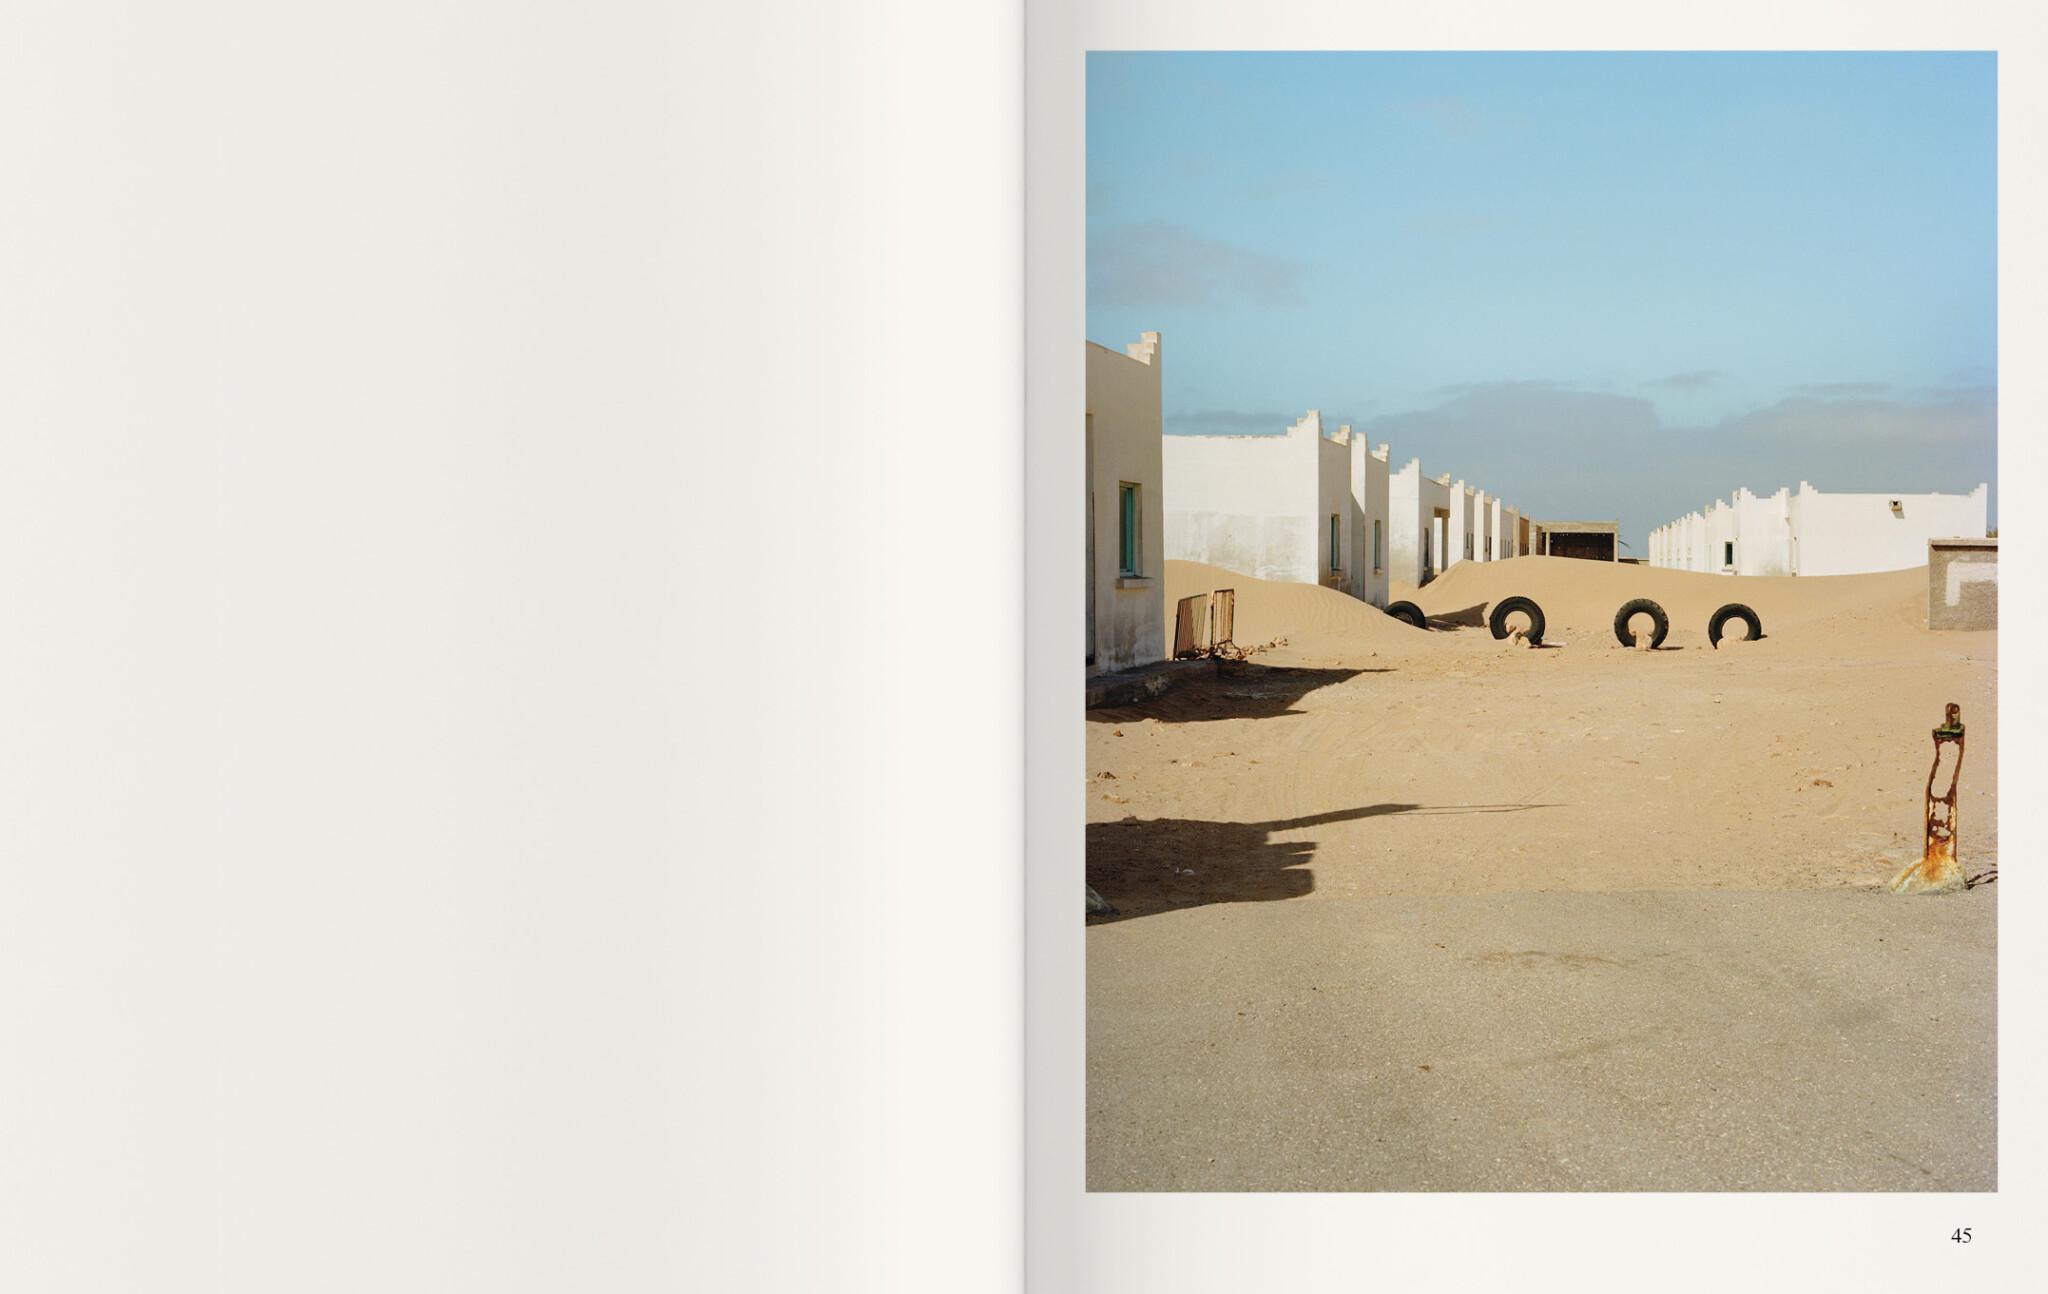 photoq-bookshop-ediciones-anomalas-federico-clavarino-ghost-stories-8